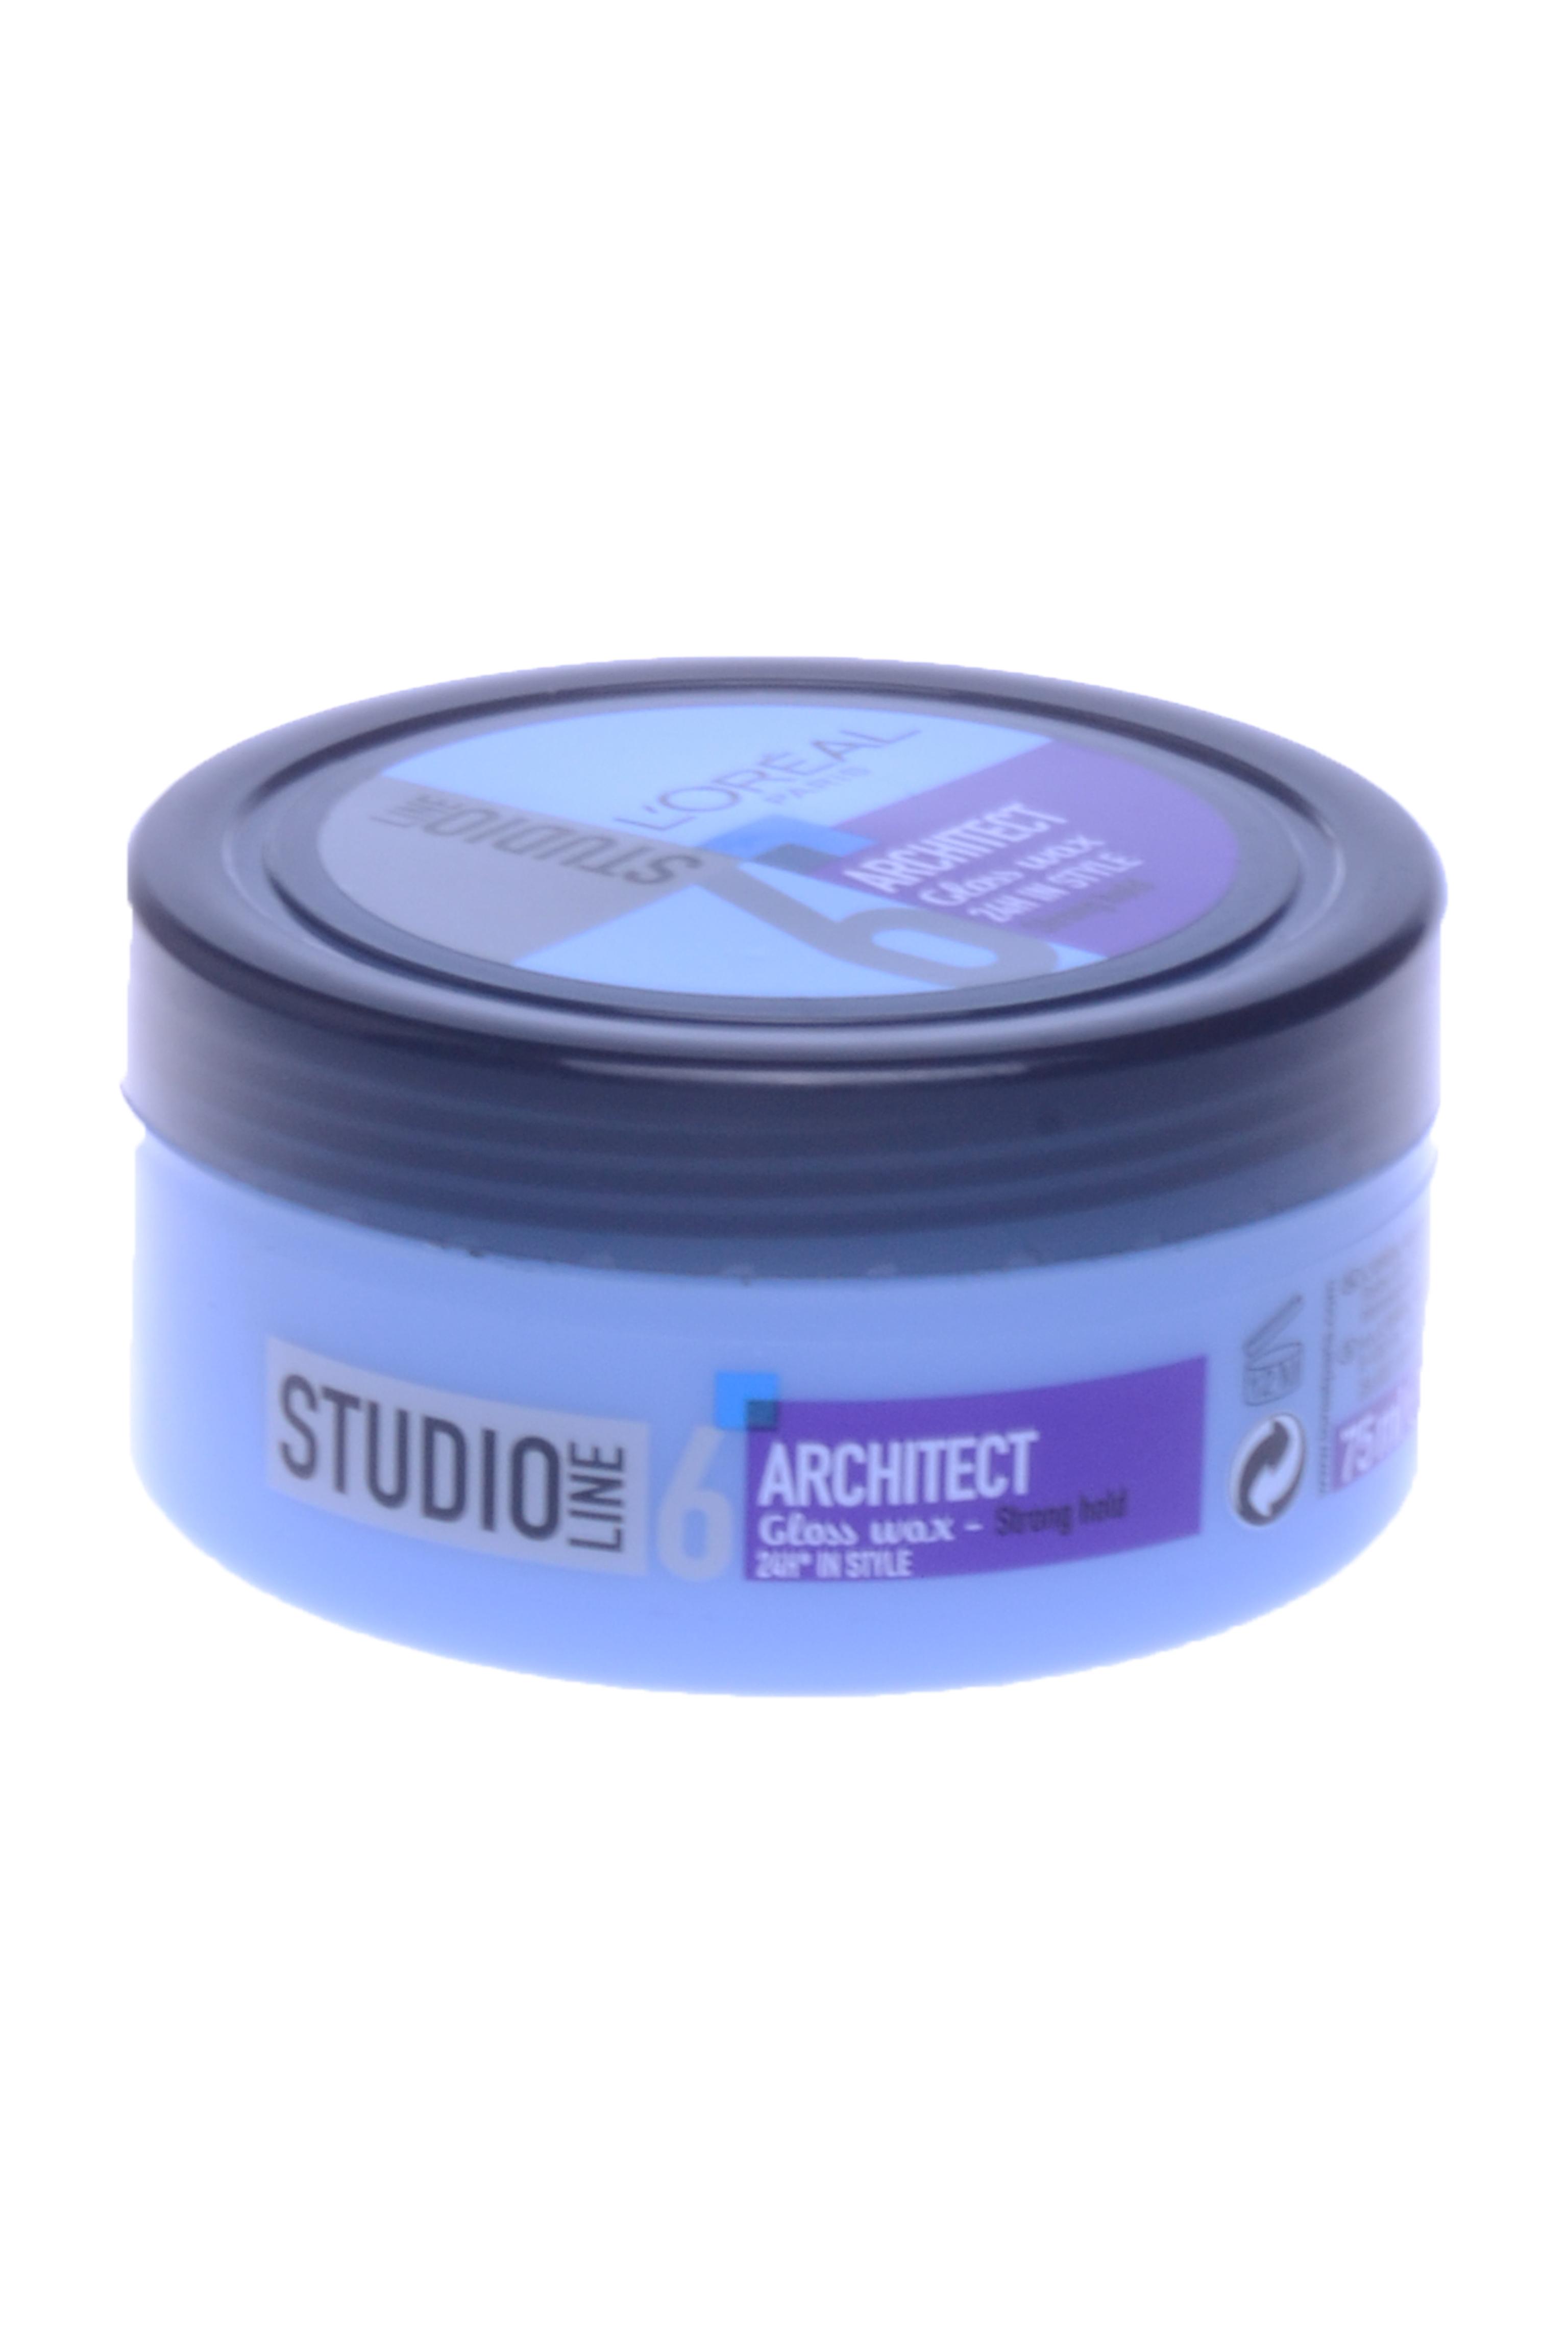 L'Oreal Studio Line Architect Gloss Wax, 75 ml